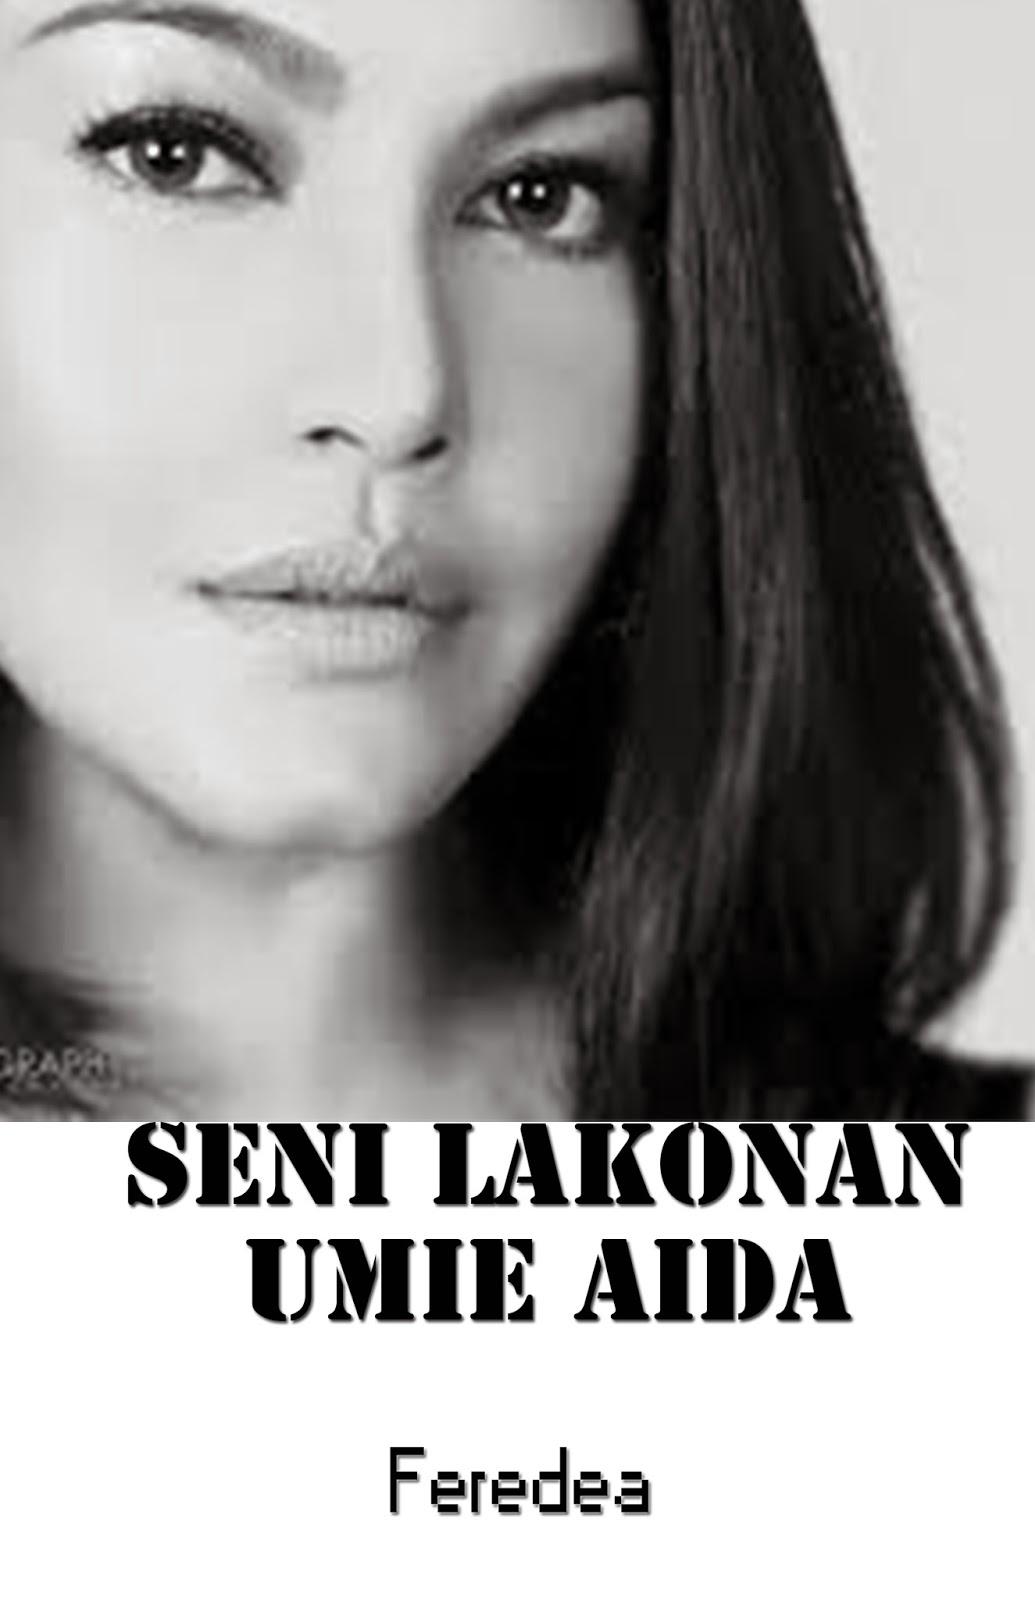 https://play.google.com/store/books/details/Feredea_Seni_Lakonan?id=WT_nAgAAQBAJ